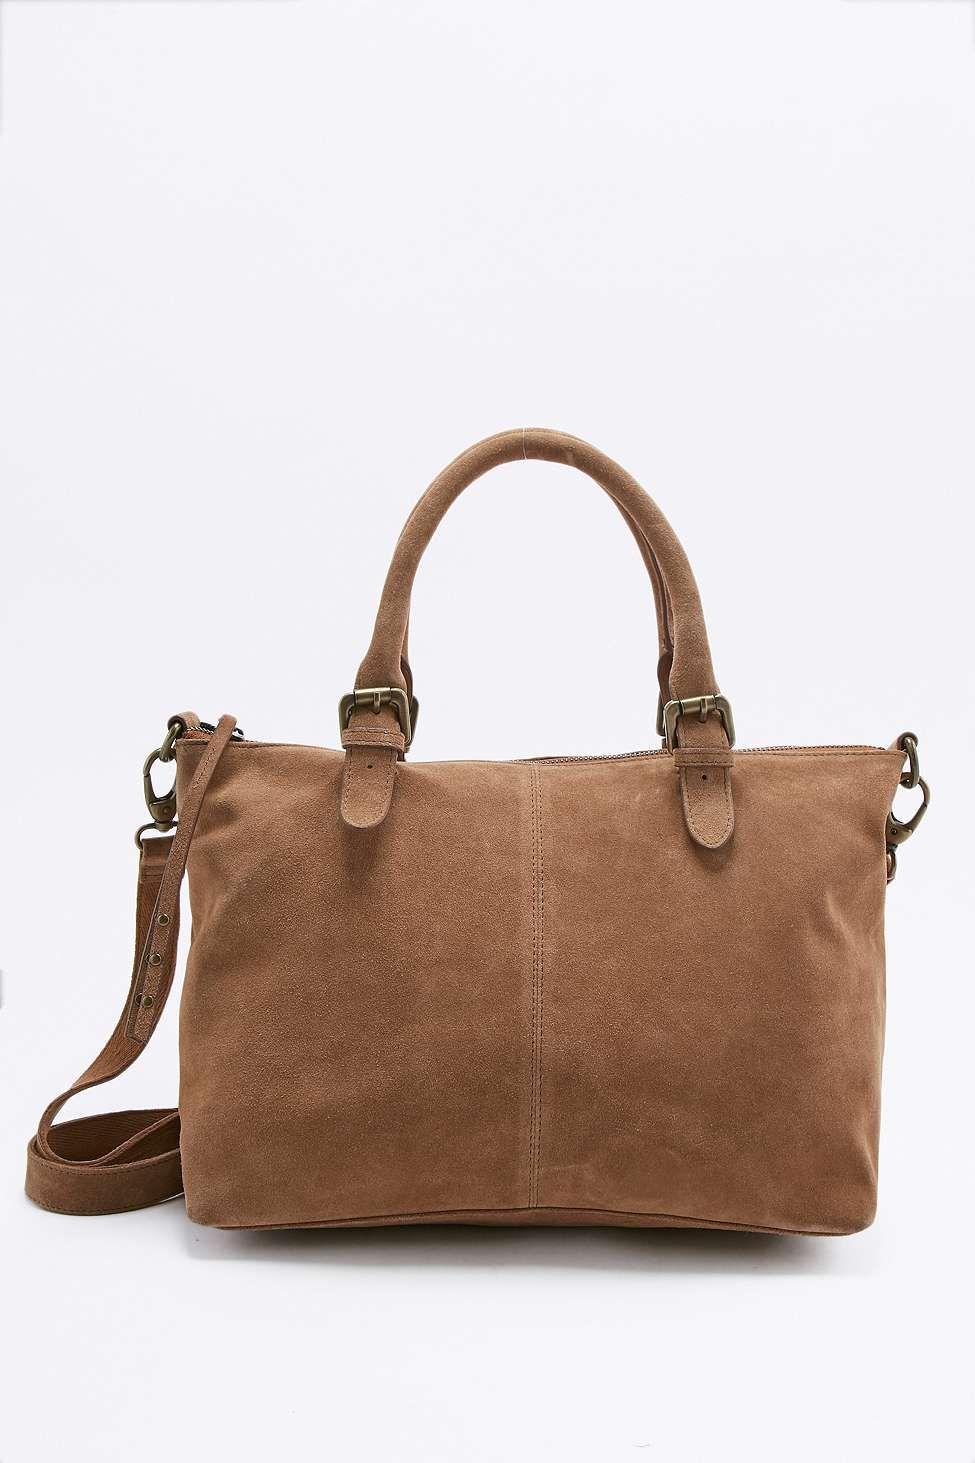 9273510527 Sac fourre-tout en daim marron   Urban outfitters   Suede tote bag ...